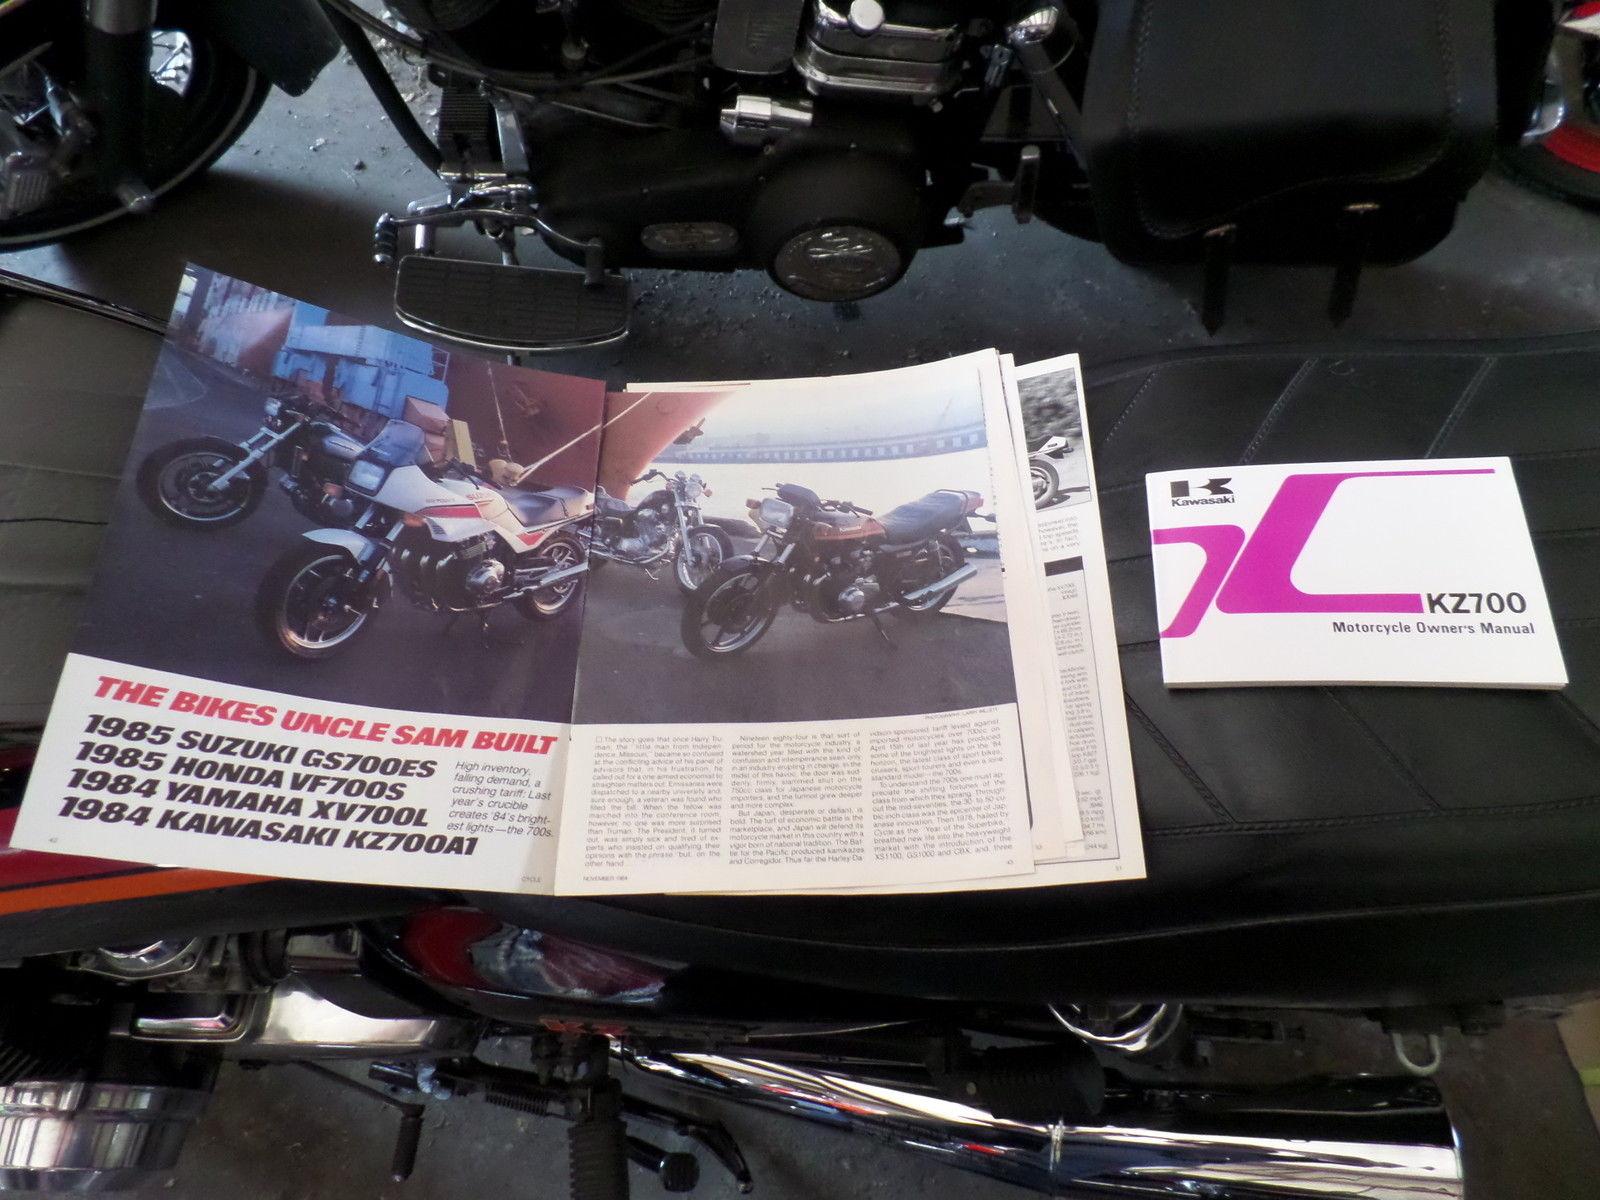 1984 kawasaki kz700 bike urious rh bike urious com Kawasaki KZ700 Tracker Kawasaki KZ750 Pressimon Red